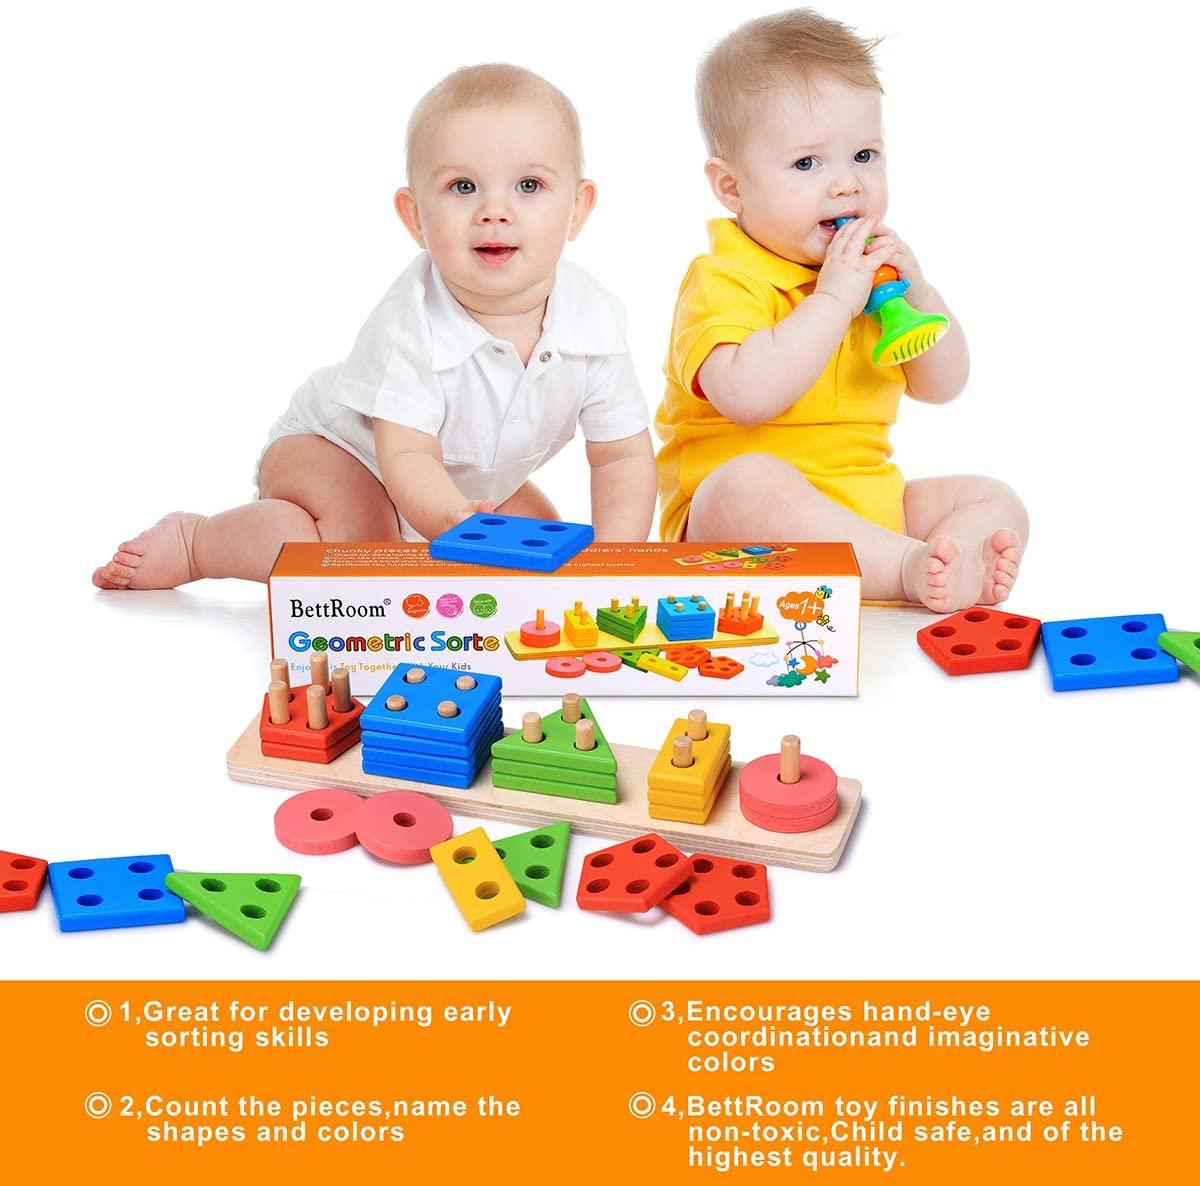 BettRoom Wooden Educational Preschool Toddler Toys for 3 4 ...